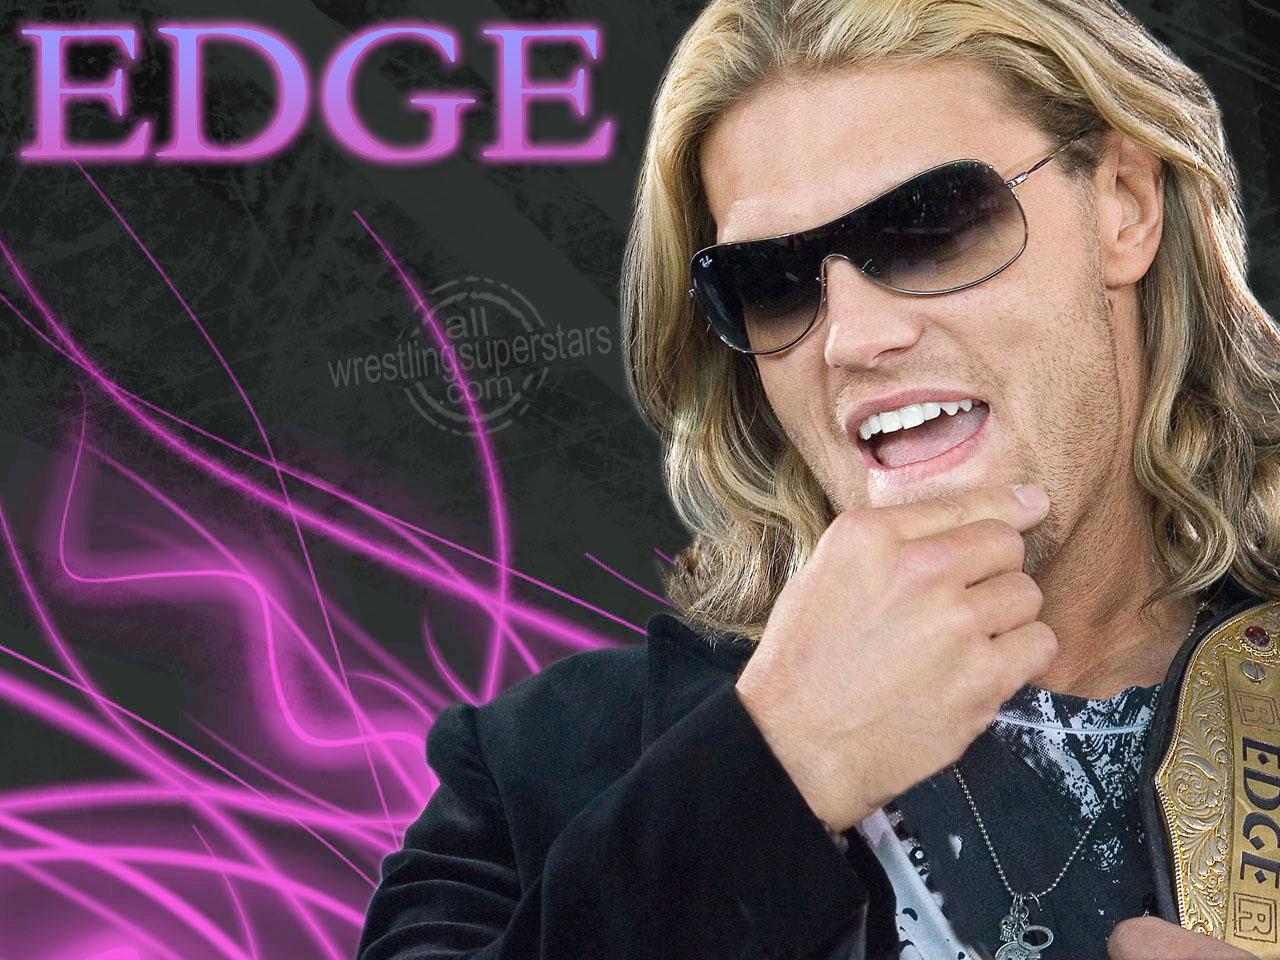 http://3.bp.blogspot.com/-wt0KYnGN8yI/T8CB4M7b1MI/AAAAAAAAAns/aDzthMO5OF4/s1600/Edge+hhhh.JPG